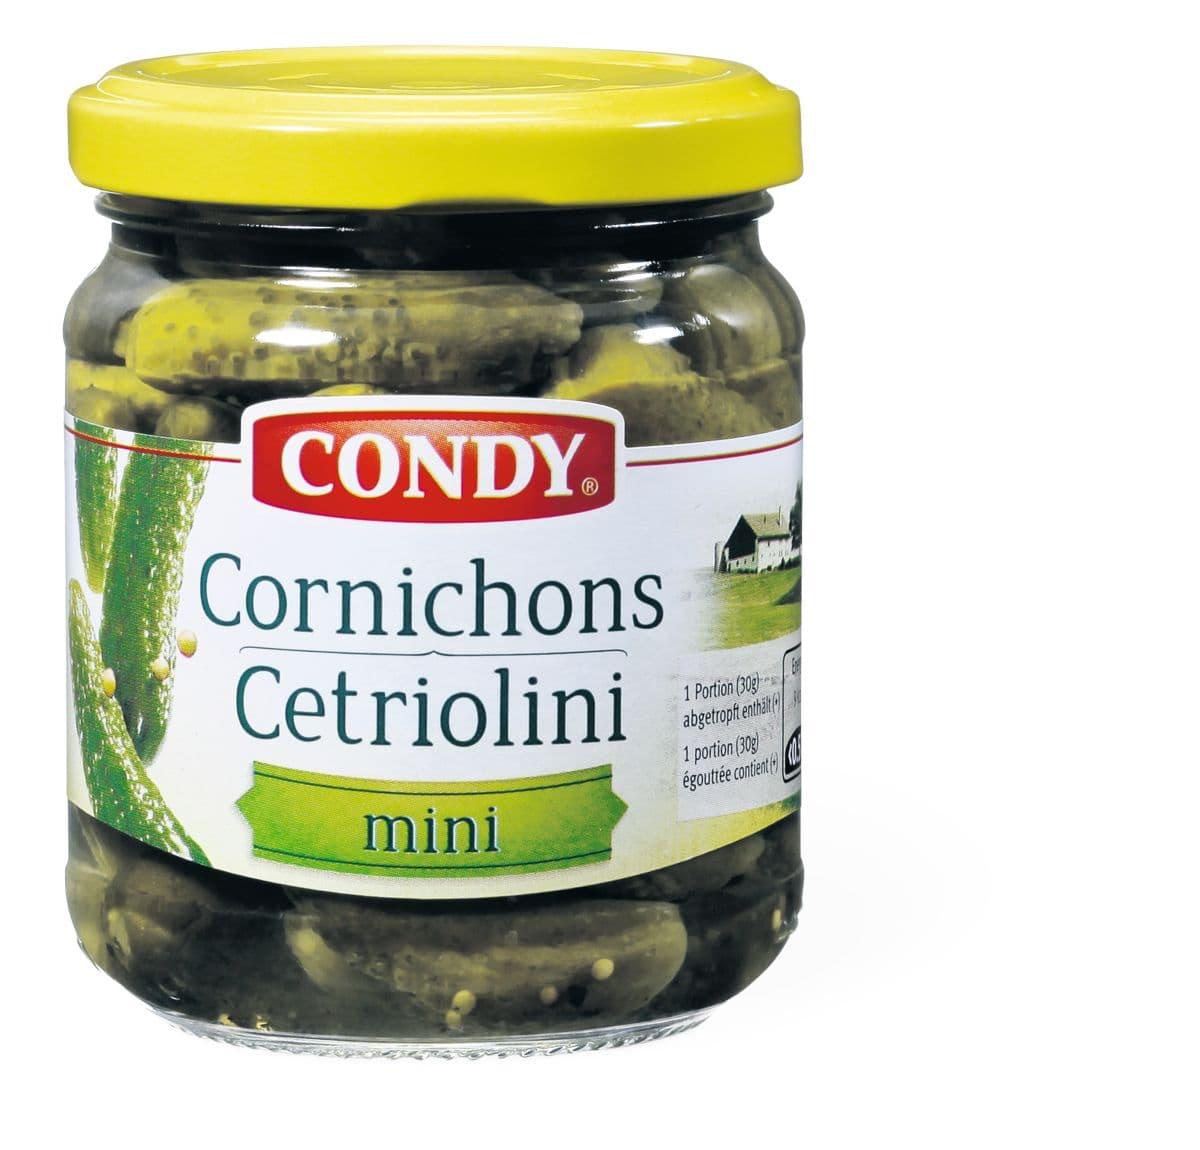 Condy Cornichons fins